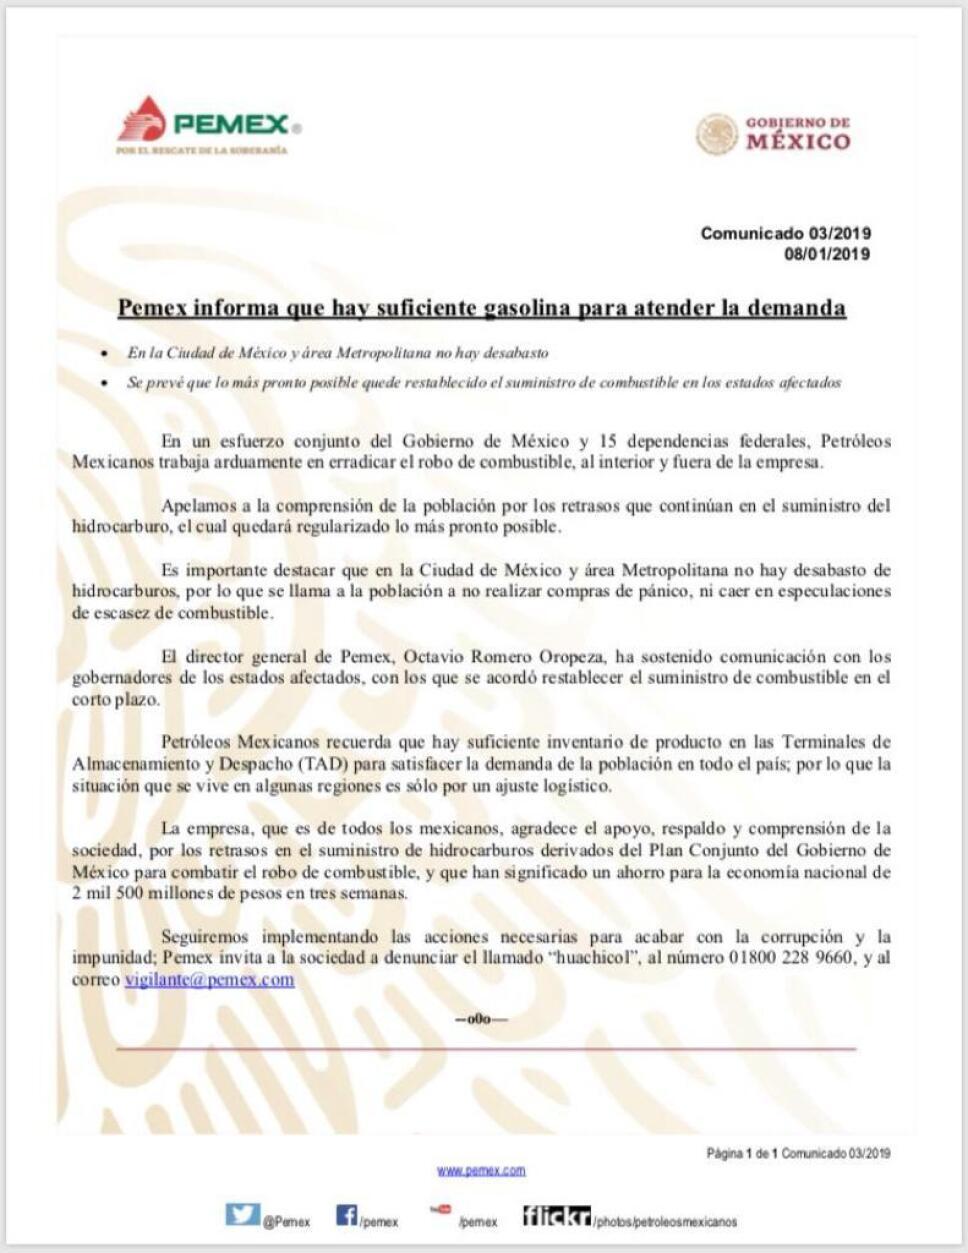 Comunicado de Pemex sobre desabasto de gasolina